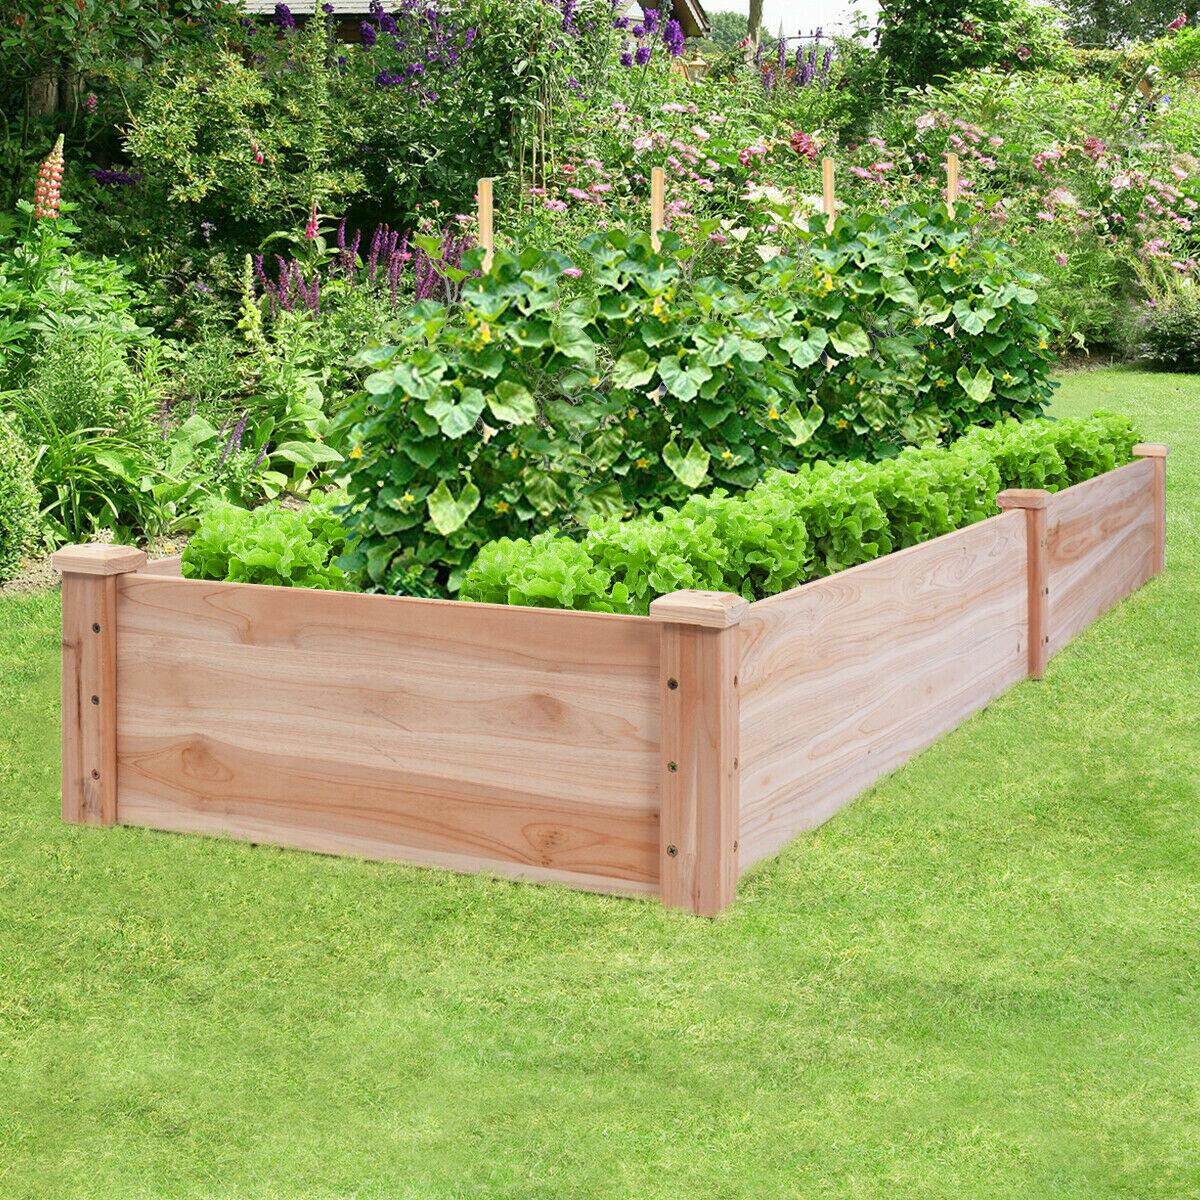 Richard Vegetable Garden 6 ft x 6 ft Cedar Wood Raised Garden